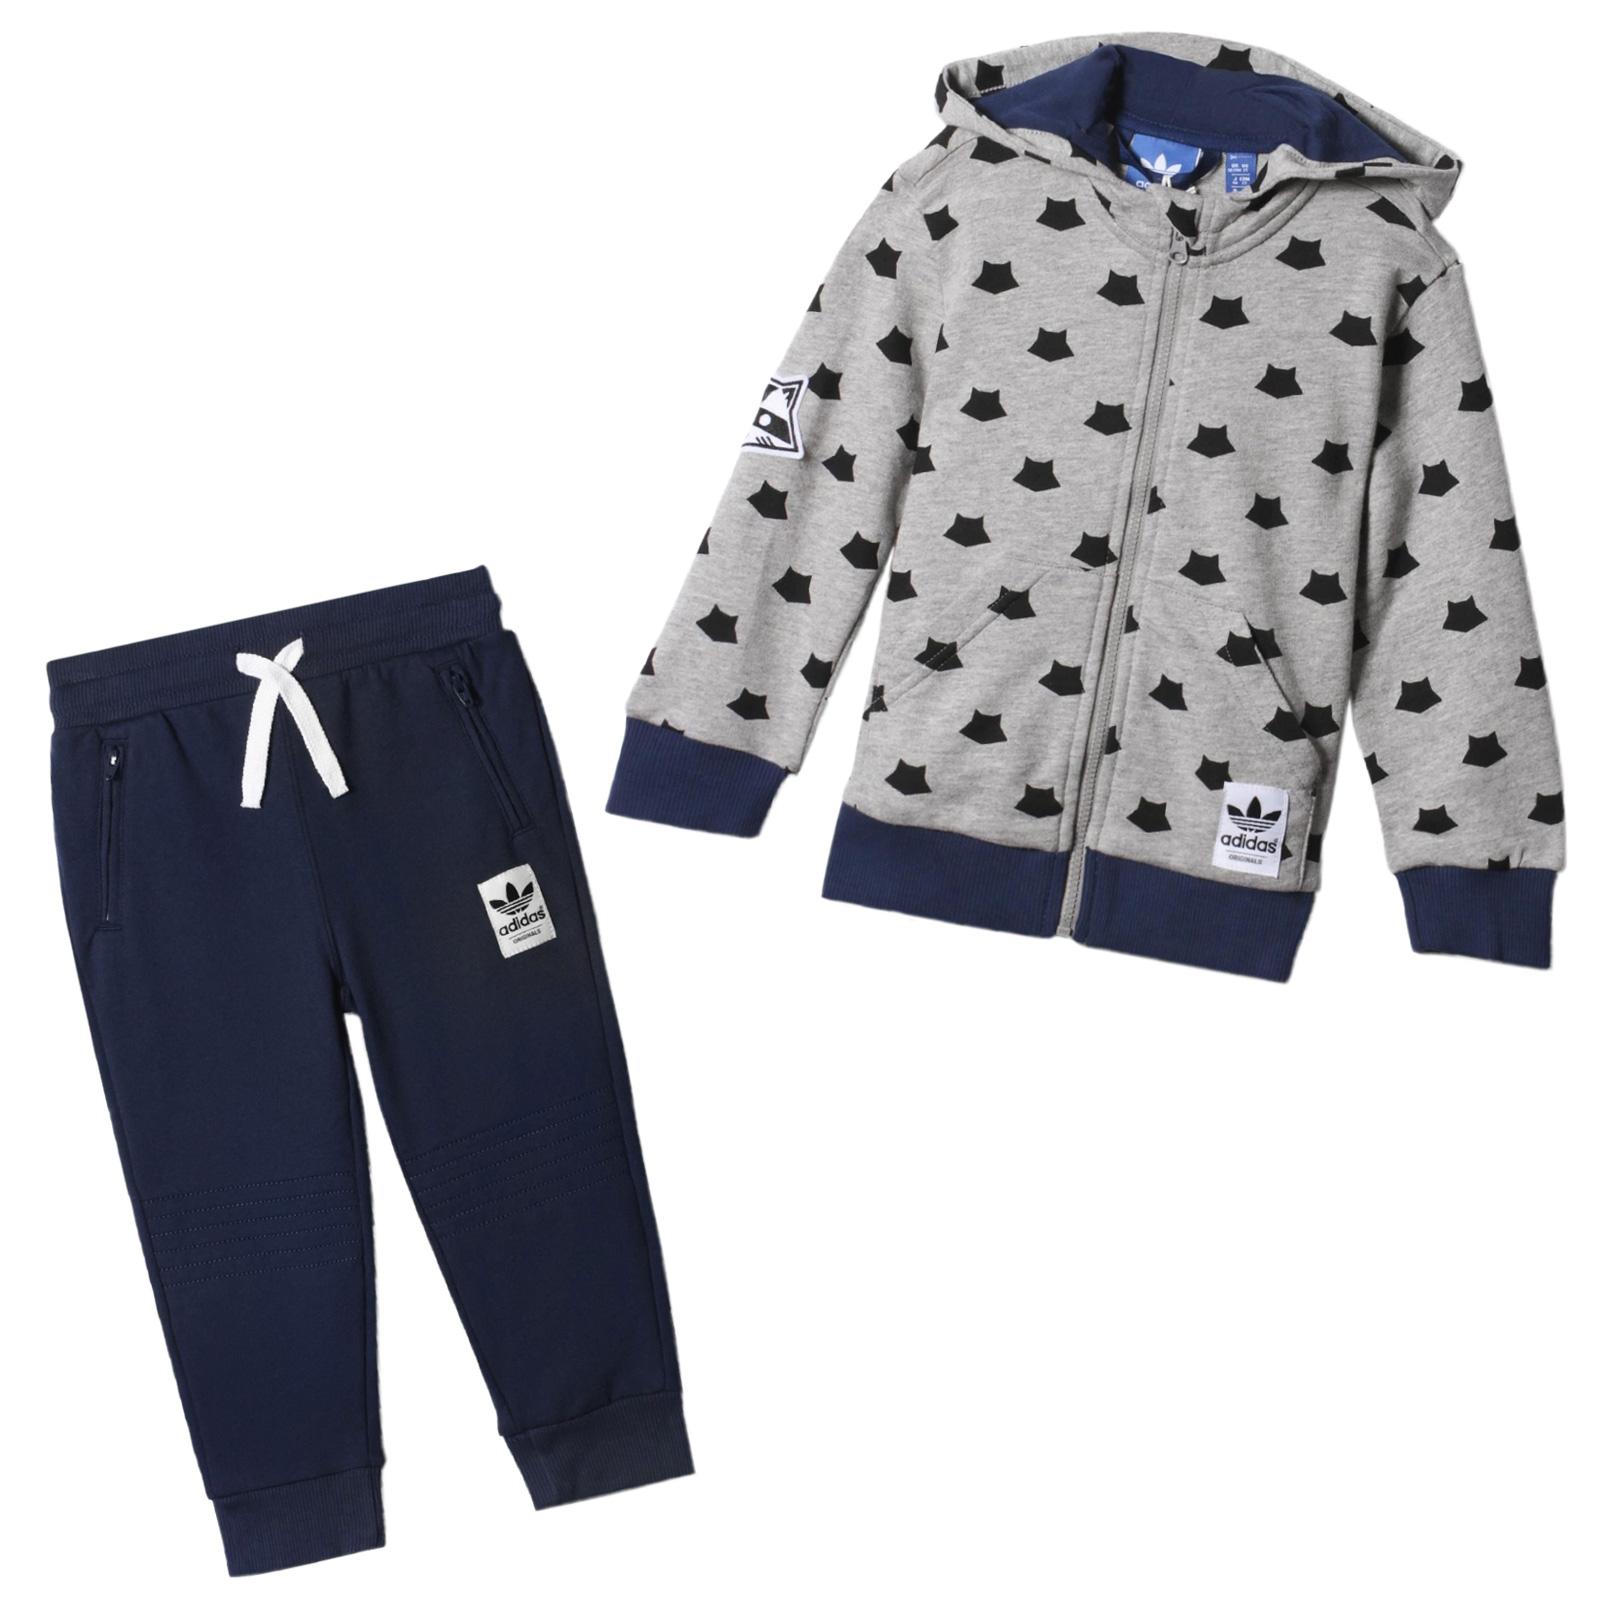 8b727d921 adidas racoon kinder baby jogger trainingsanzug